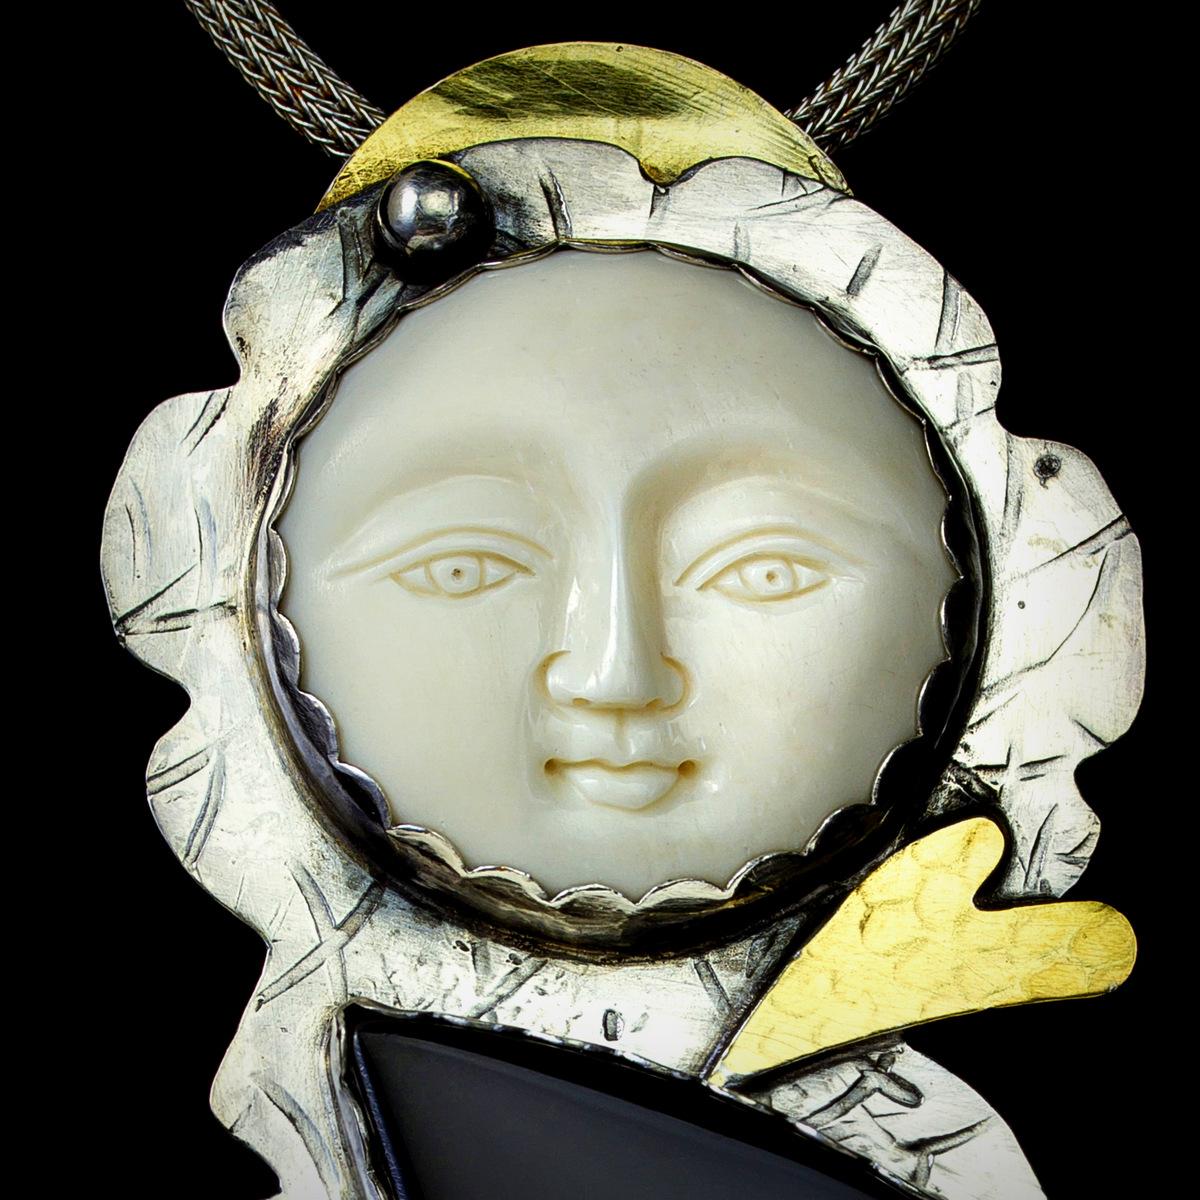 4-Fine Craft, Siver & Gold Jewelry, Artist Process, Syvia McCollum-003.JPG